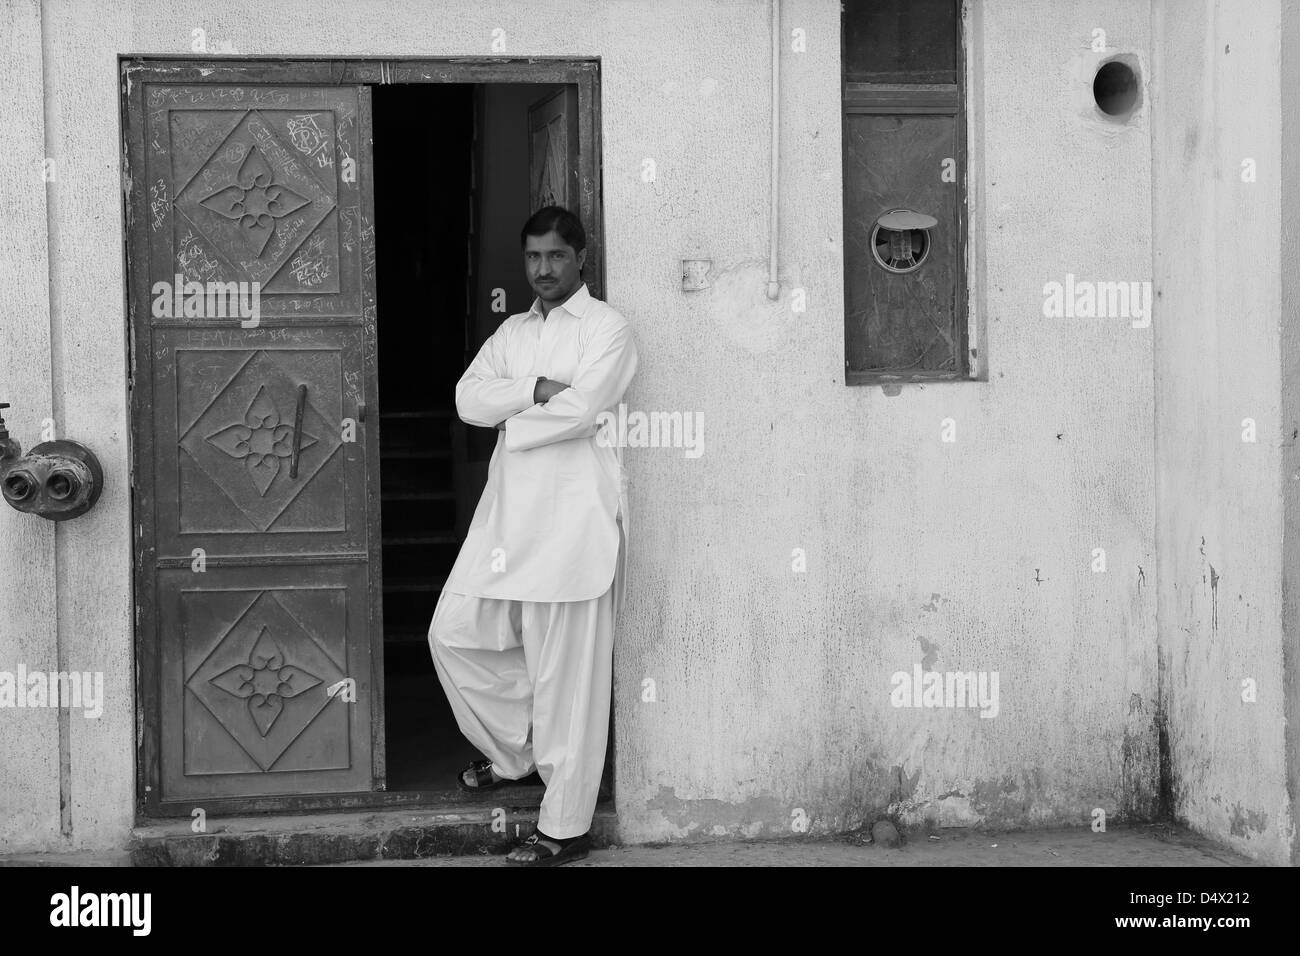 Portrait of shop owner standing in doorway, Dubai, United Arab Emirates - Stock Image